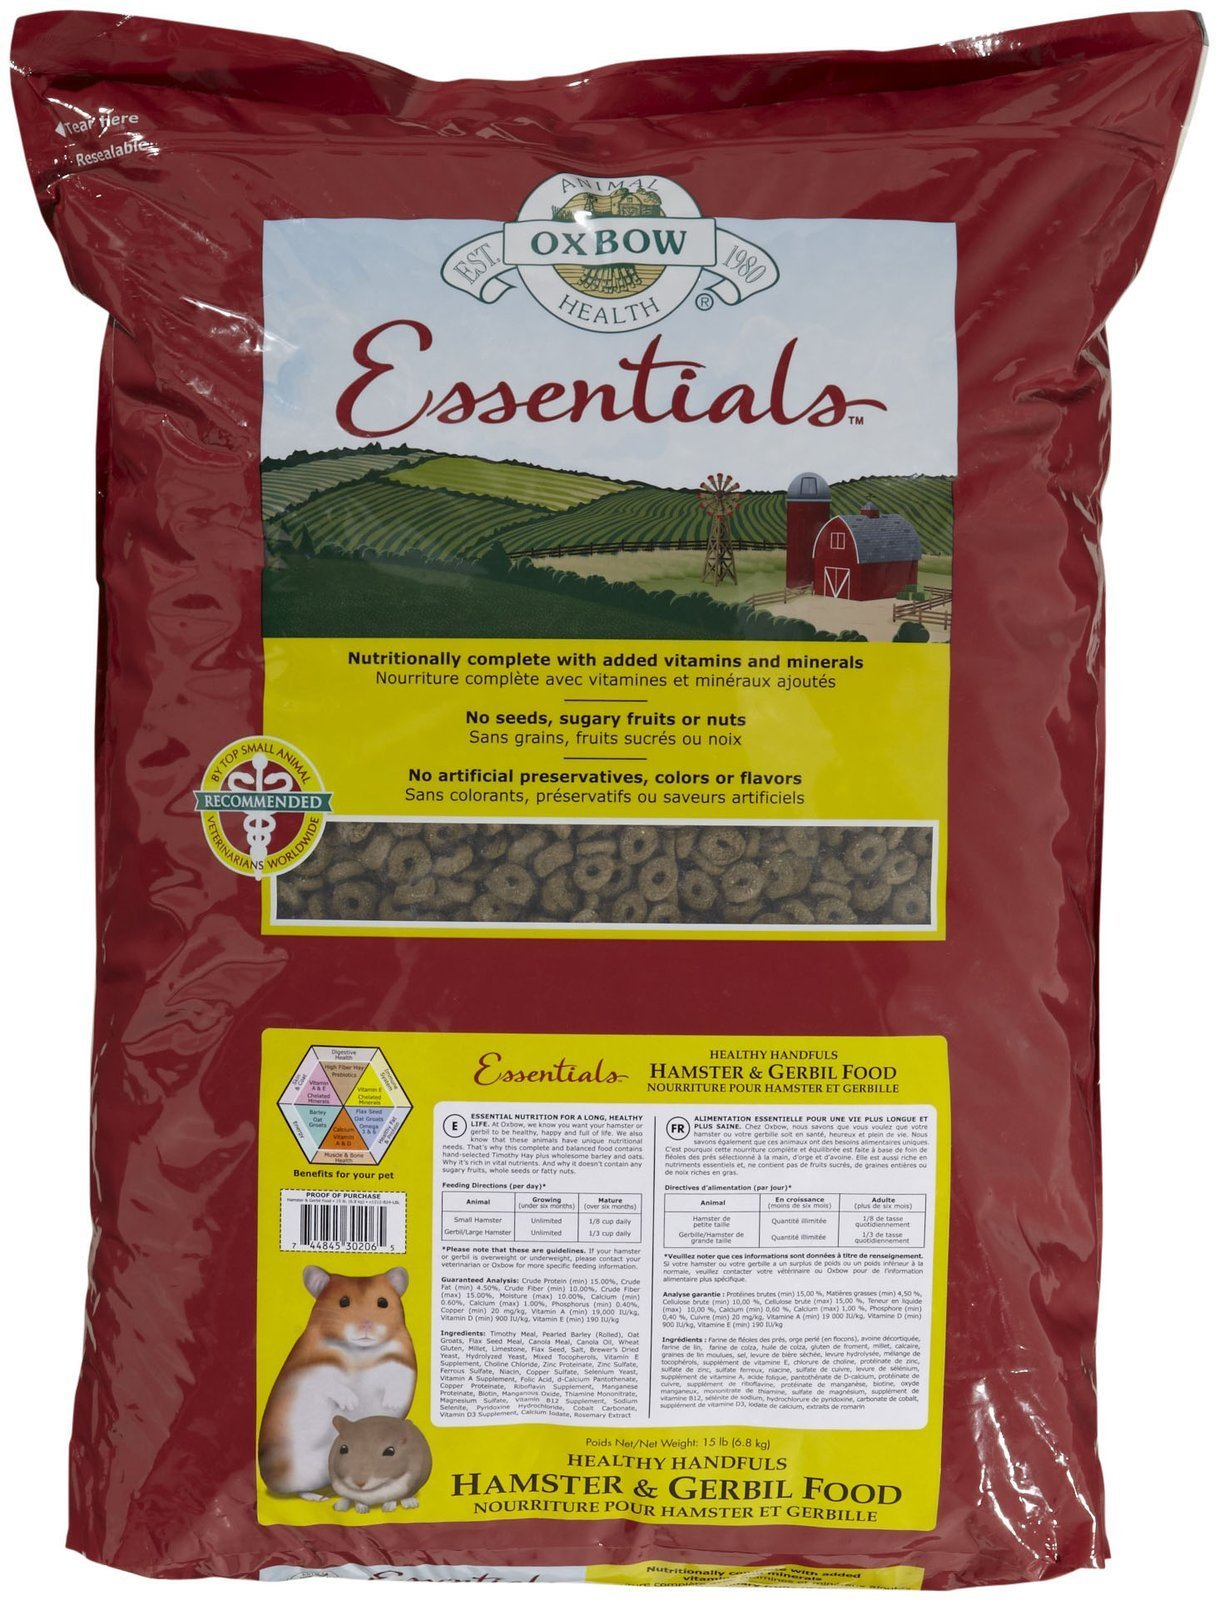 Oxbow Animal Health Healthy Handfuls Essentials Hamster/Gerbil Food, 15-Pound